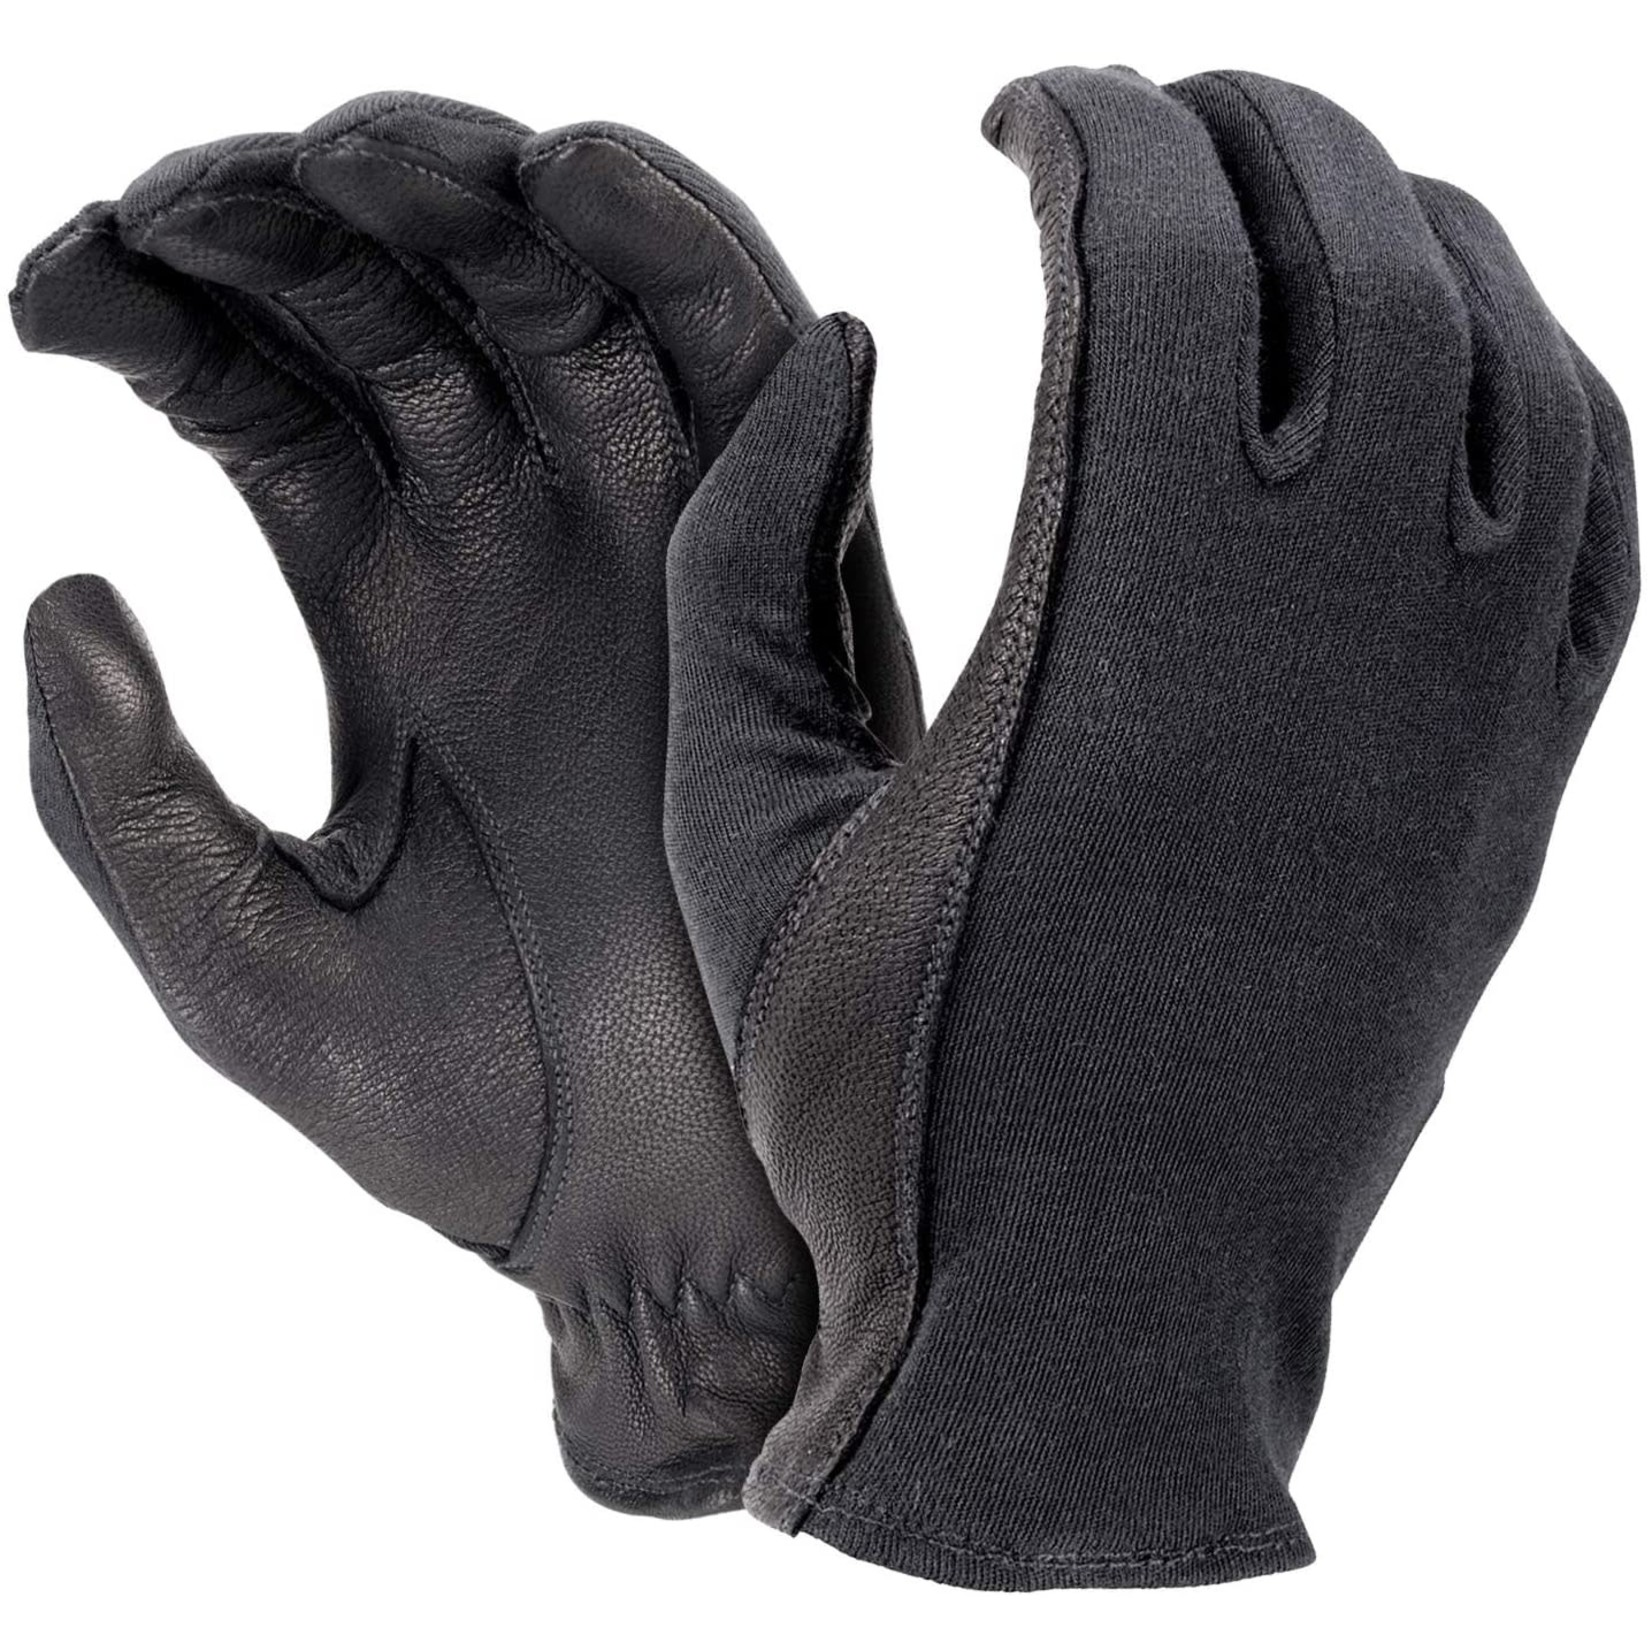 Hatch Hatch Shooting Glove W/ Kevlar KSG500